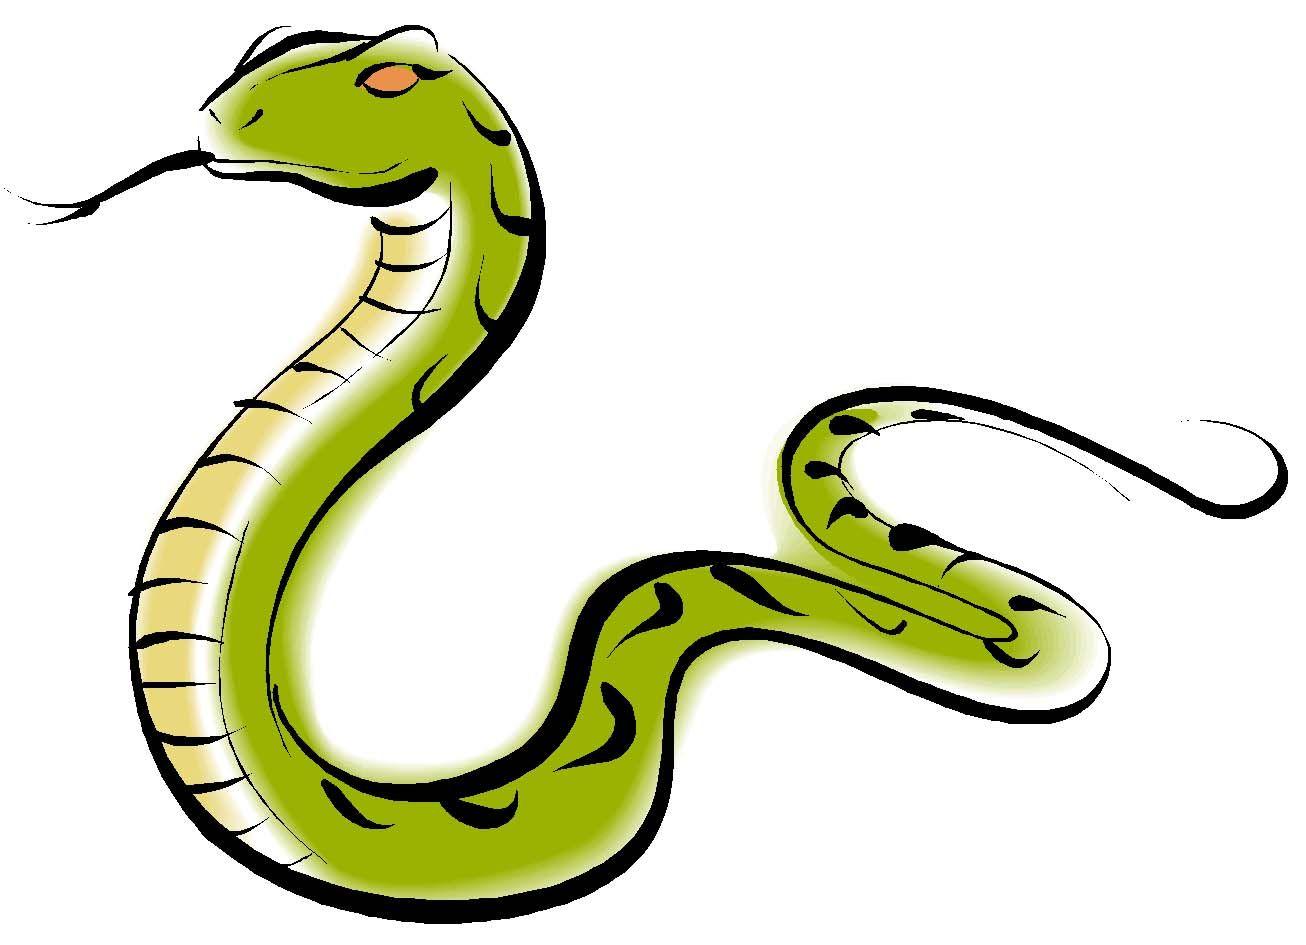 snake clipart free clipart images 2 pencil drawings pinterest rh pinterest com clipart snake heads clipart snake eyes